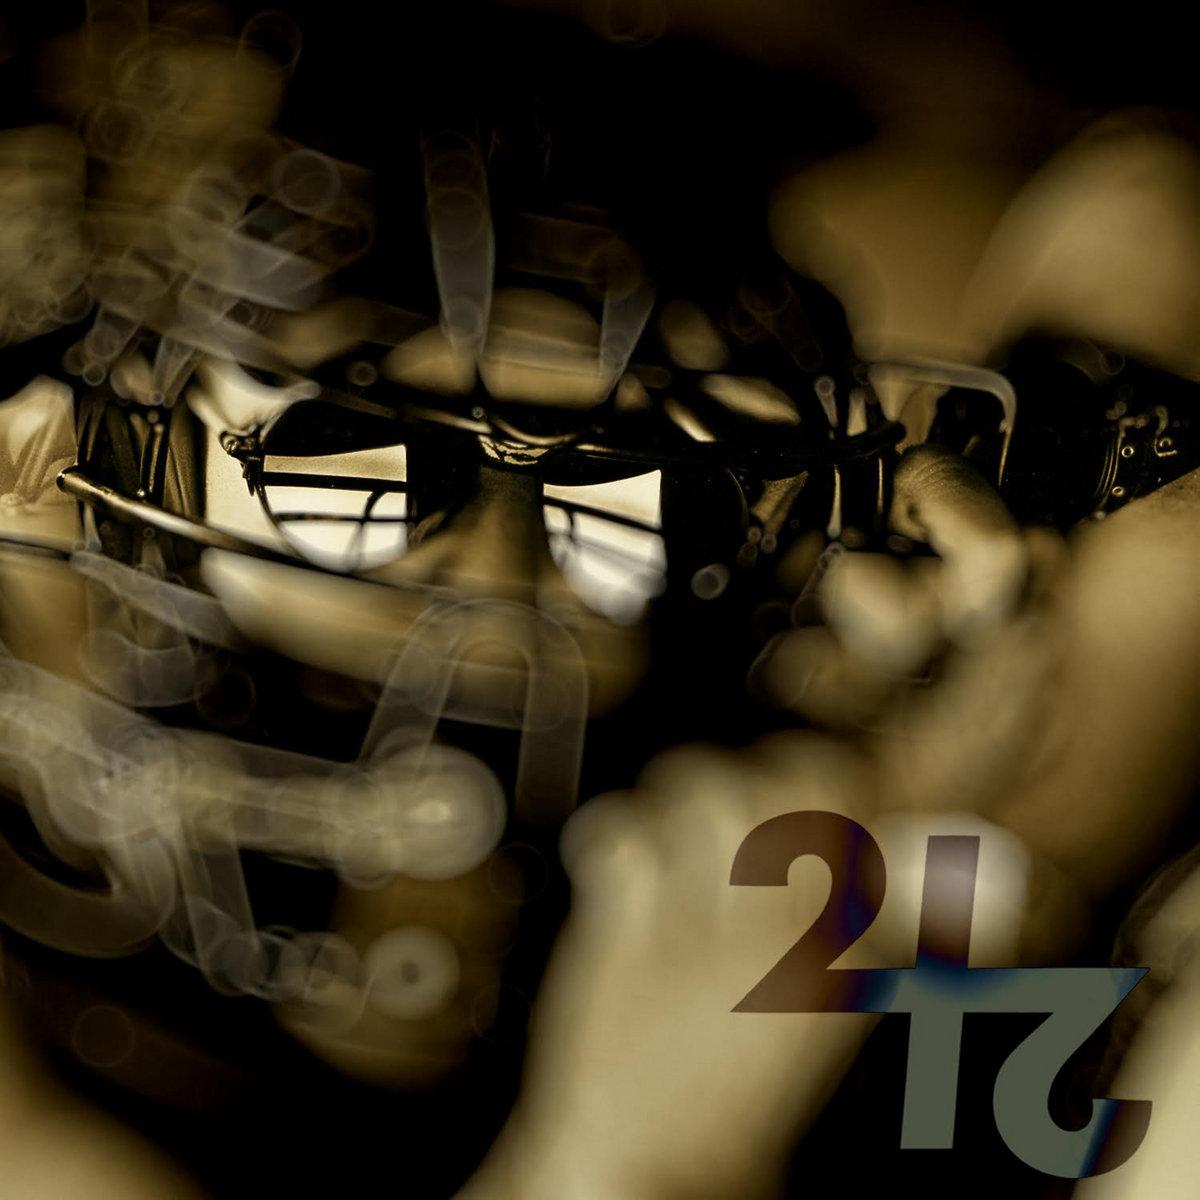 Lovely Day (Remastered) / Take One (RadicalG Mix) | Alfa Matrix